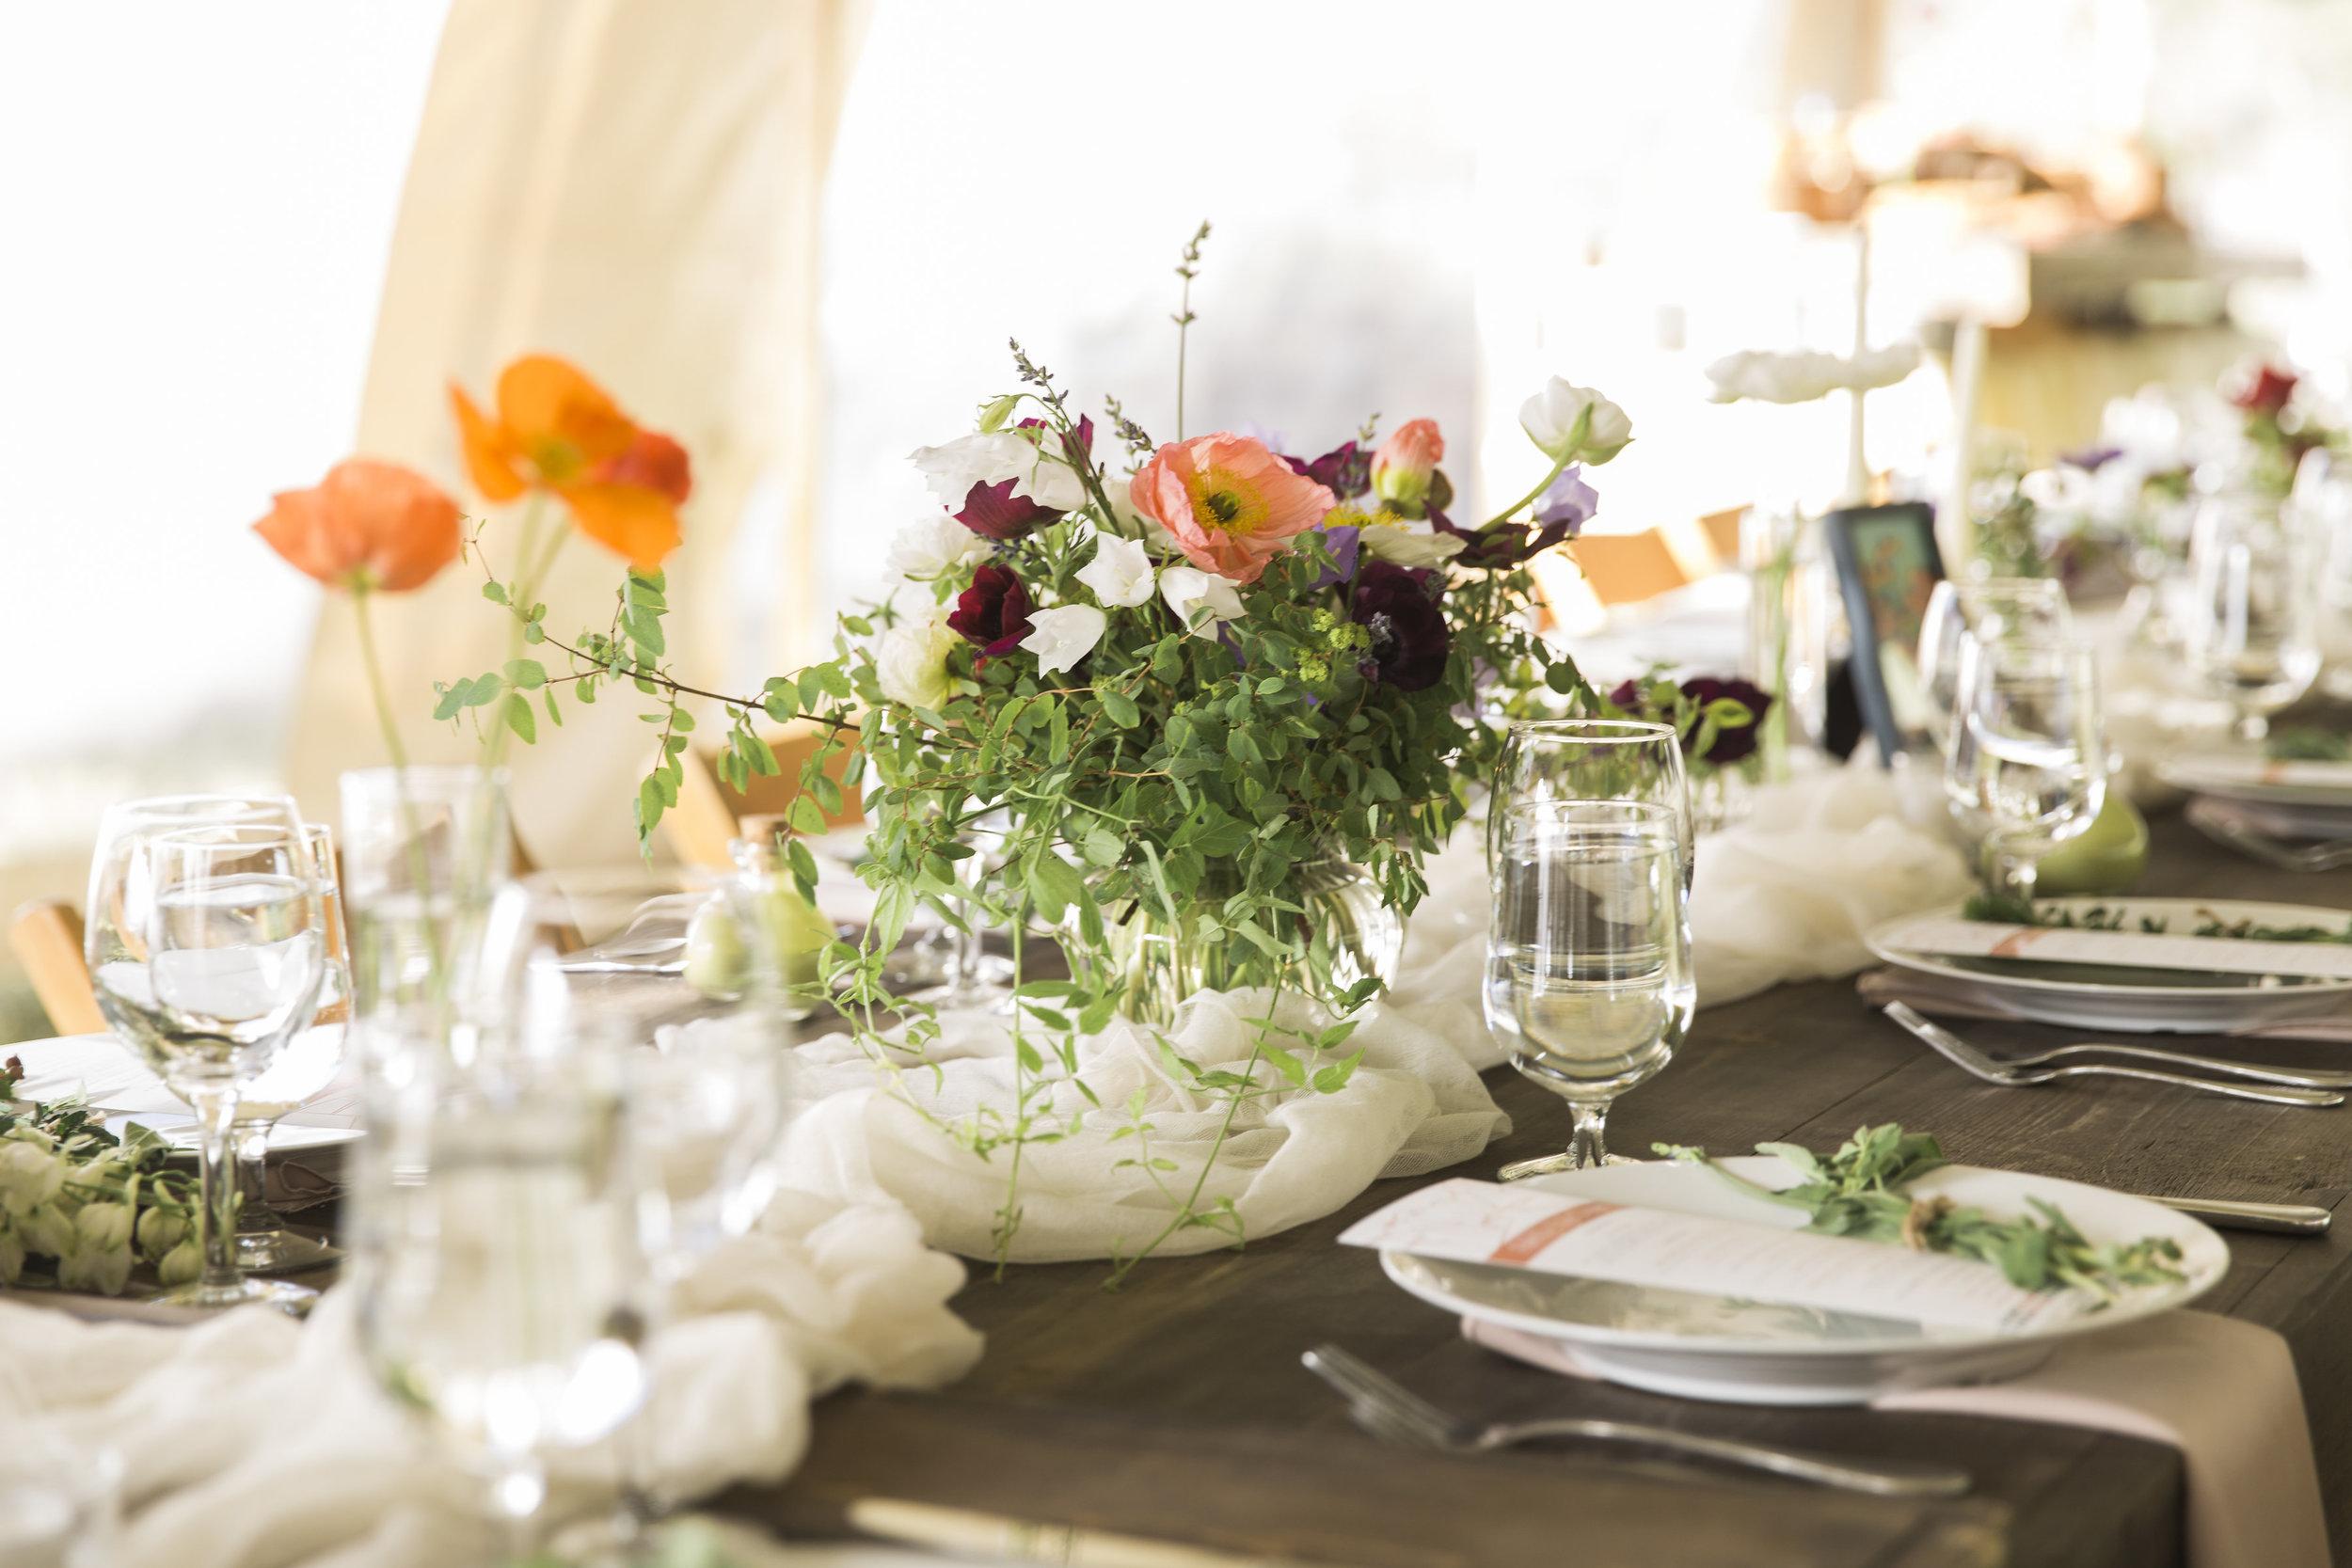 649-Karissa-Shockey-wedding-selects.jpg